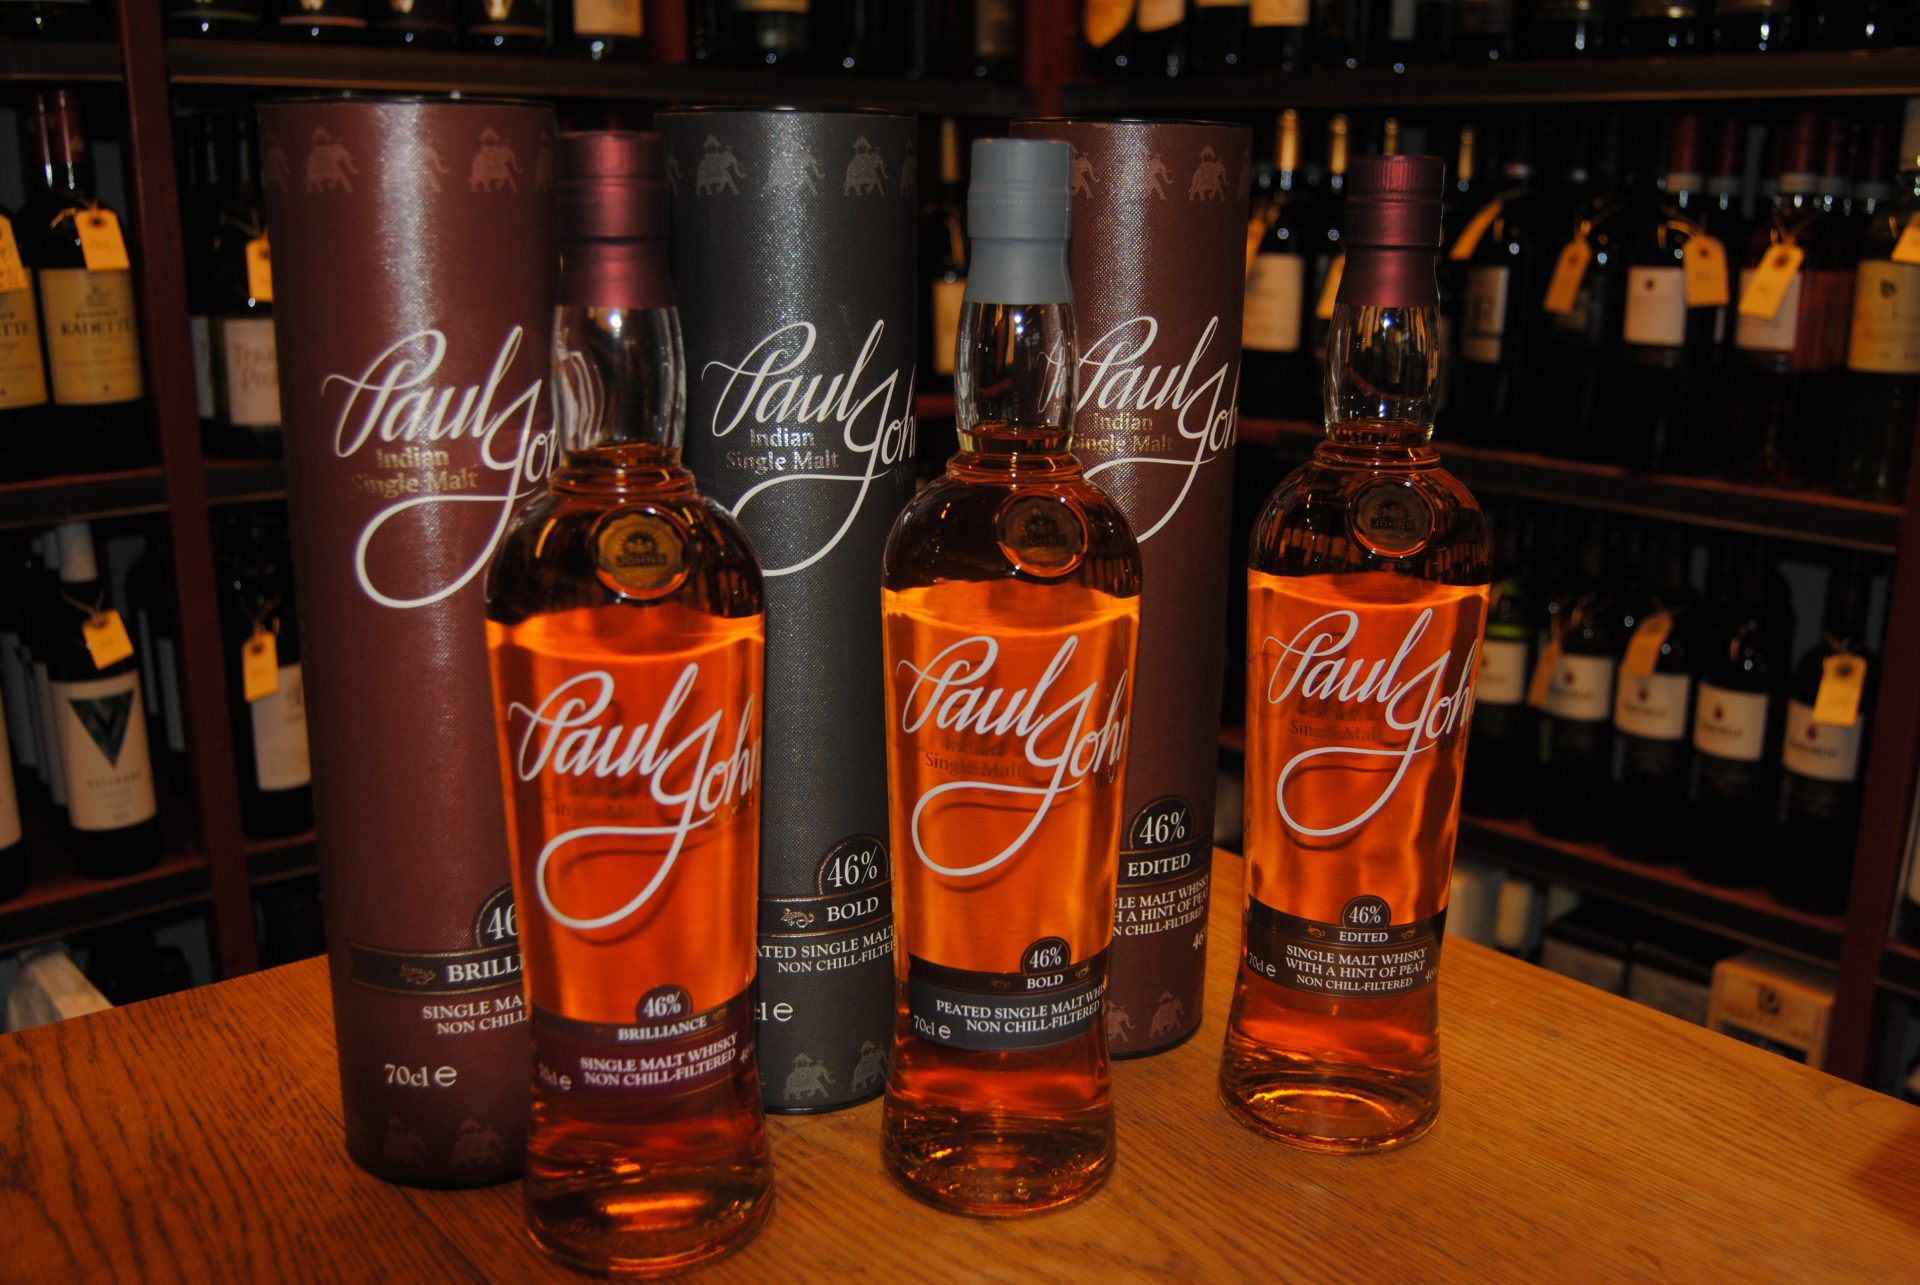 Paul John Whisky  Brilliance single malt whisky  Bold Peated single malt whisky  Edited Hint of Peat single malt whisky